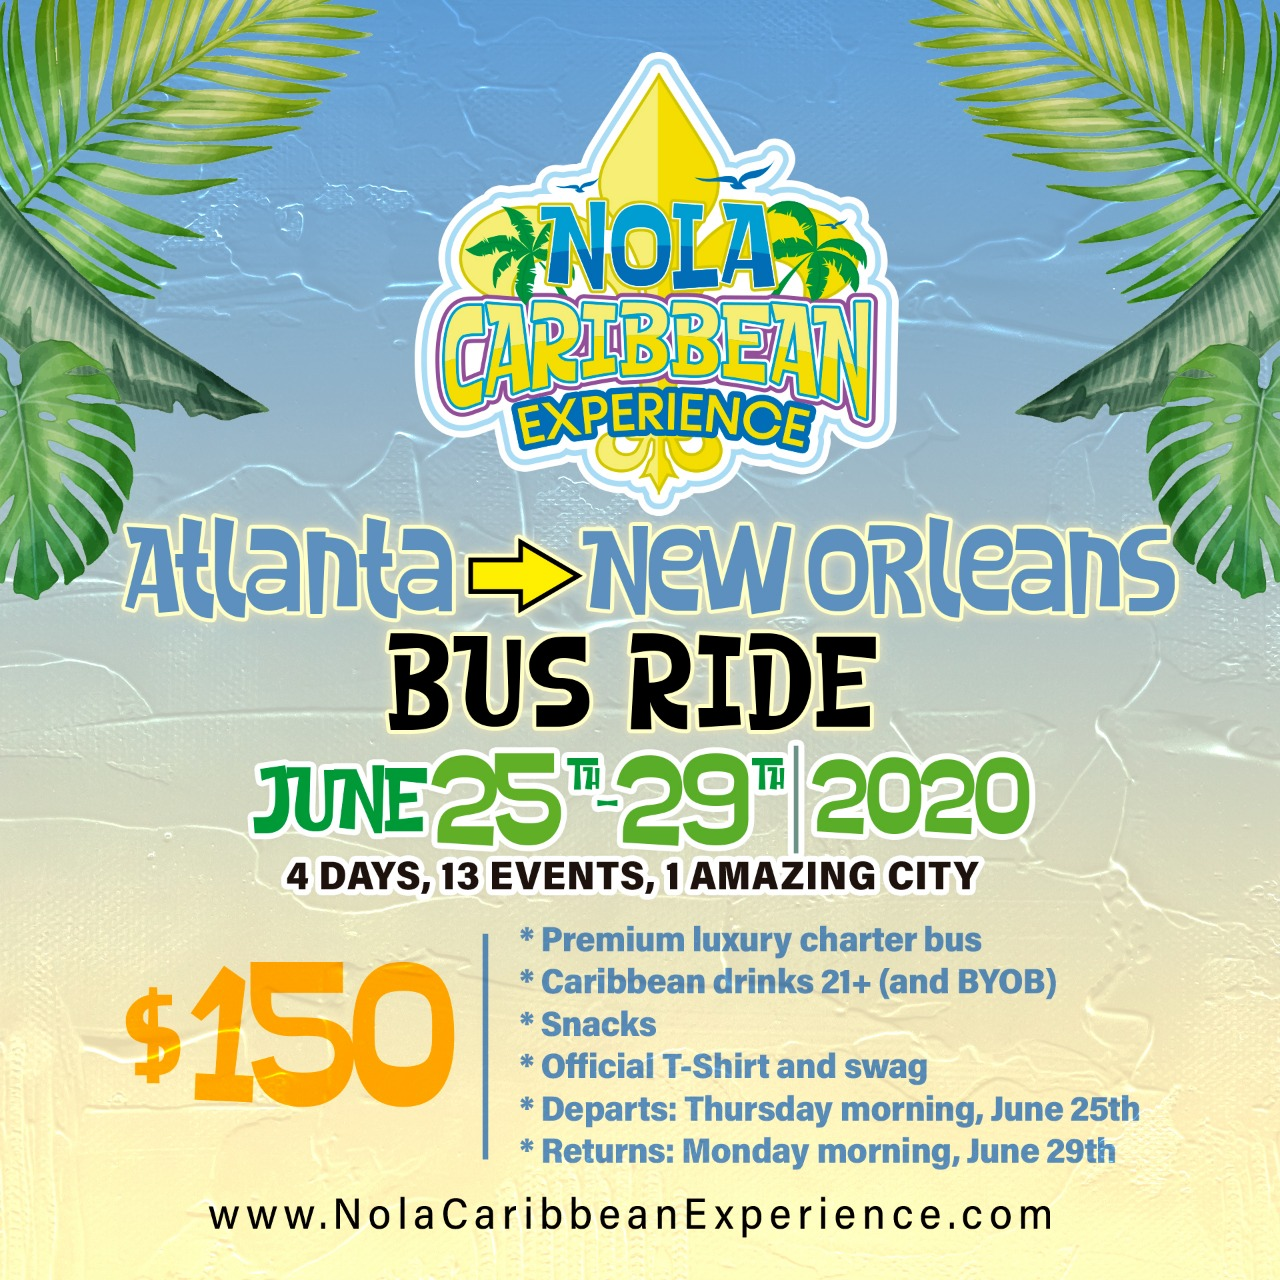 Atlanta Bus.JPG